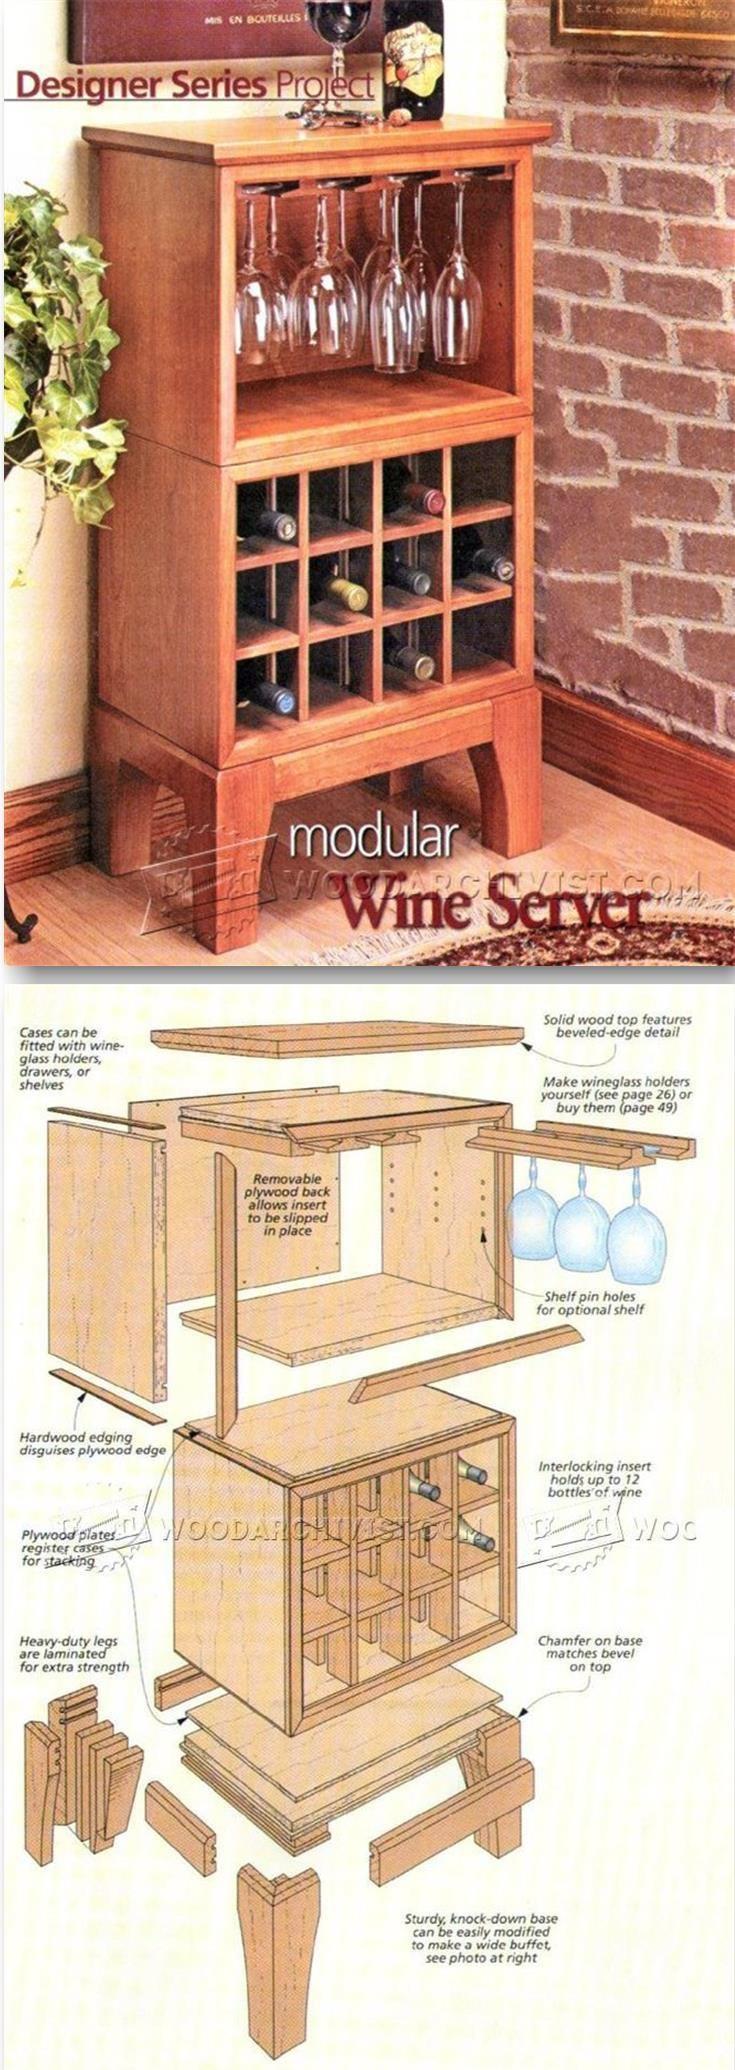 Wine Server Plans - Furniture Plans and Projects | WoodArchivist.com